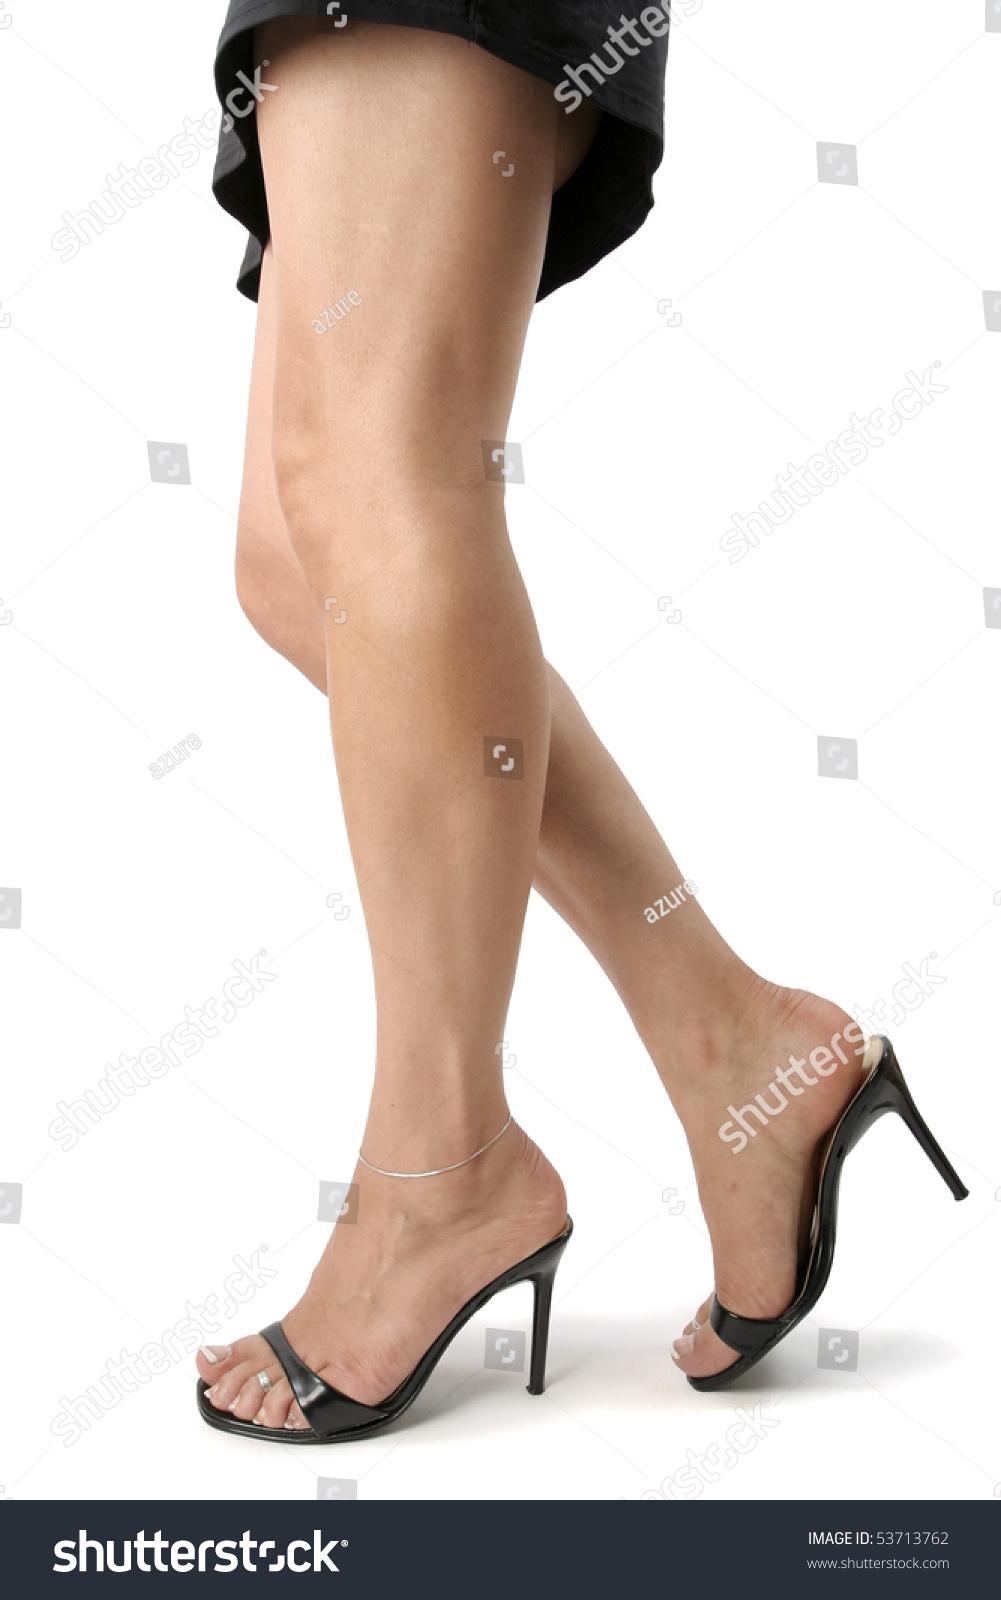 Beautiful Woman Legs Feet Black Heels Stock Photo (Edit Now ...